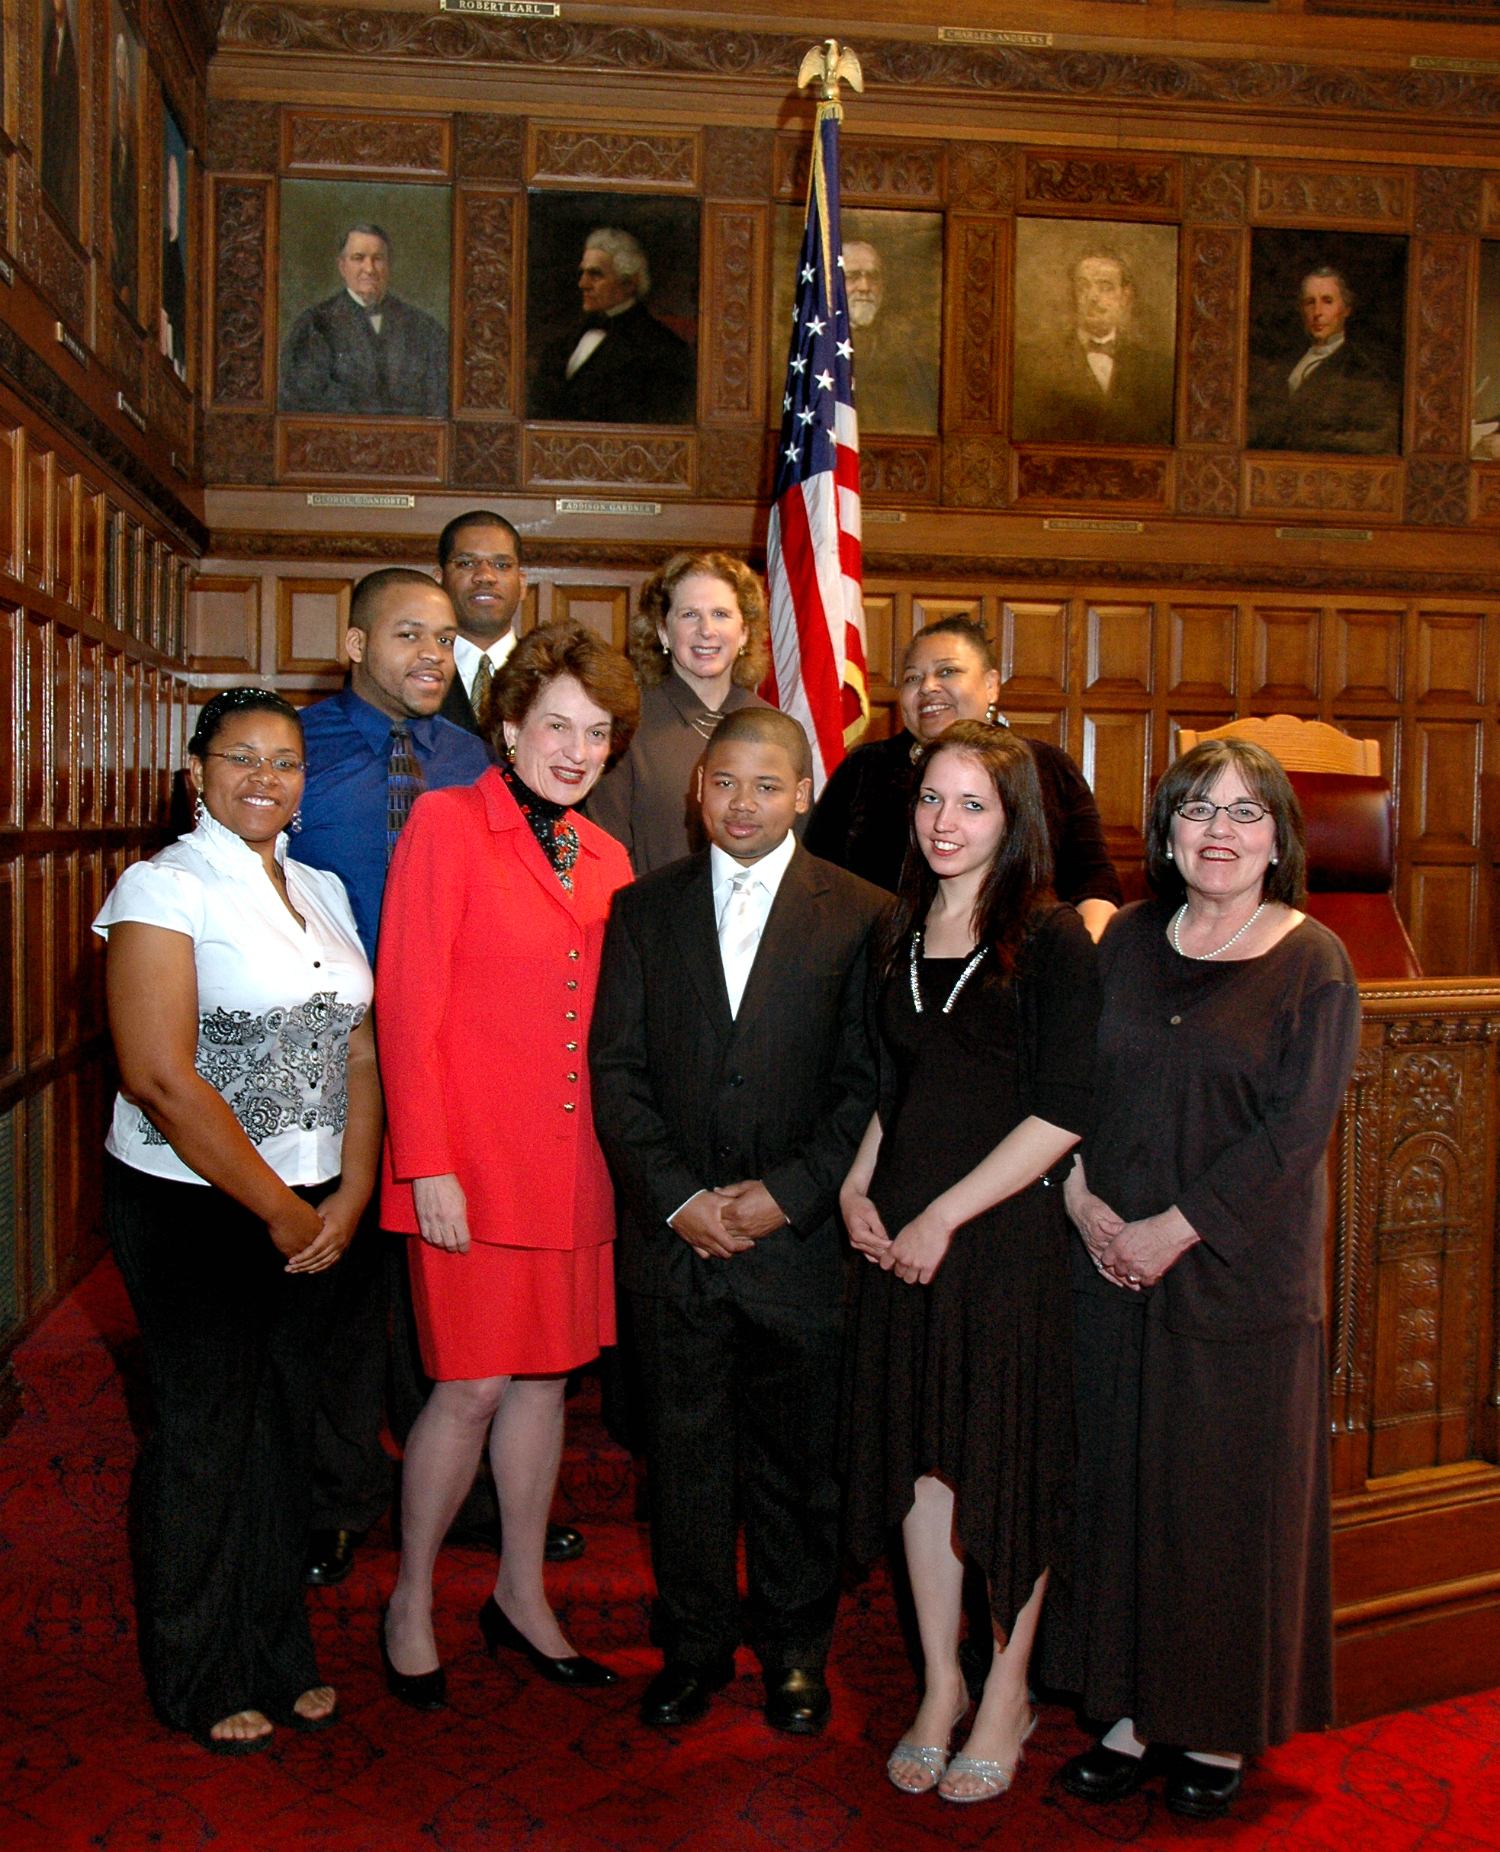 Judge Kaye, Elijah Fagan-Solis, Family